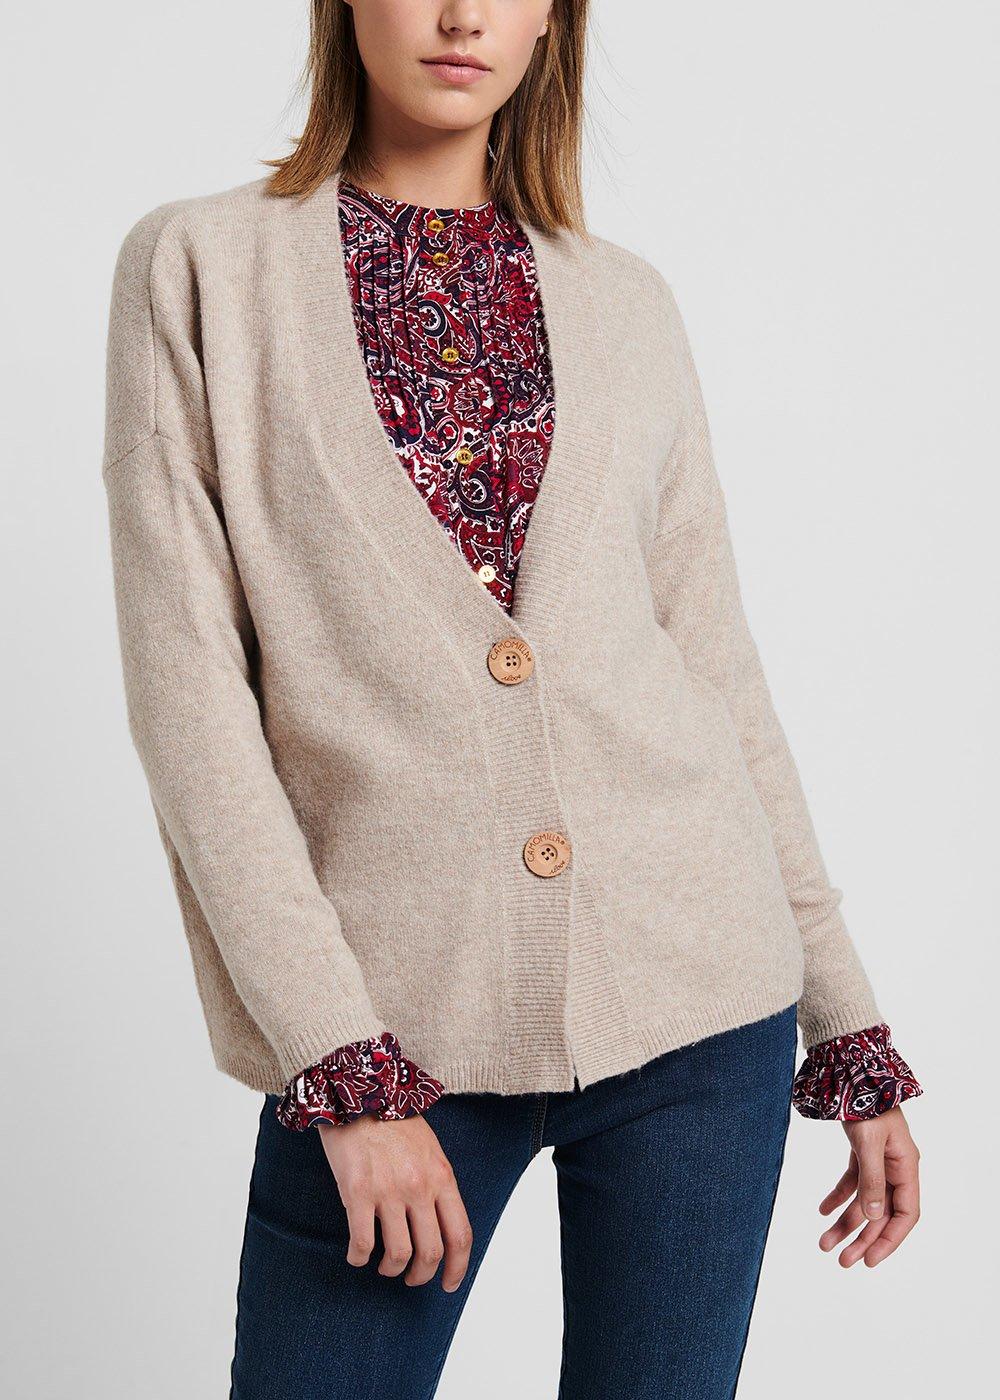 Mastic - coloured wool cardigan - Mastic - Woman